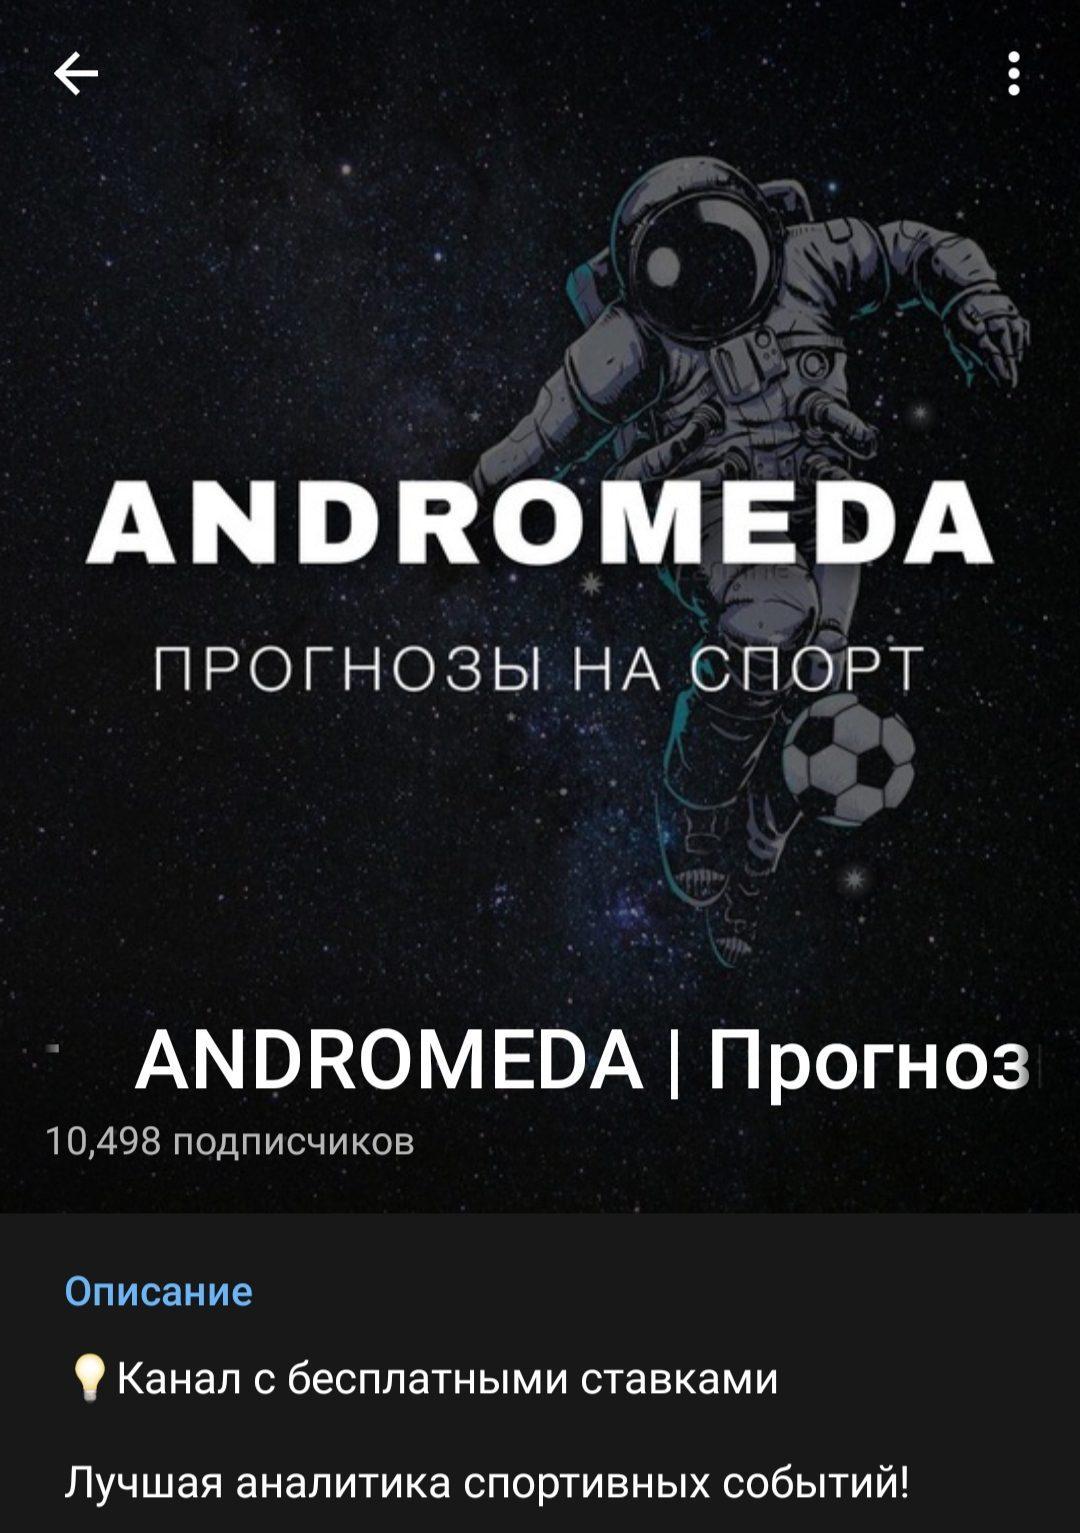 ANDROMEDA | Прогнозы на спорт в Телеграмм